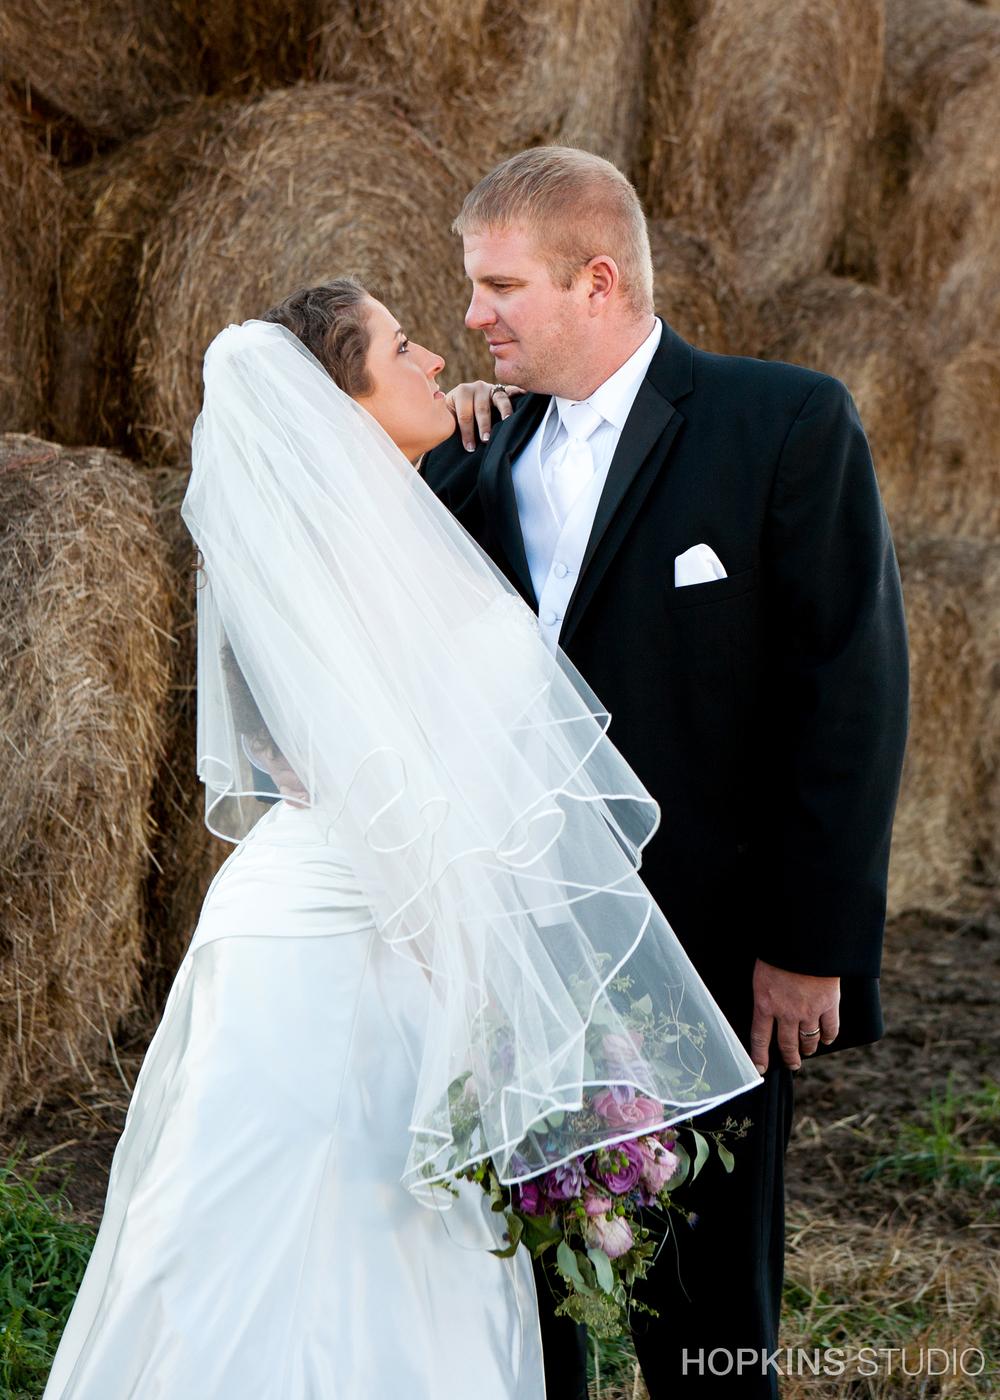 Wedding-Photography-Vineland-Center-Southwest-Michigan_29.jpg